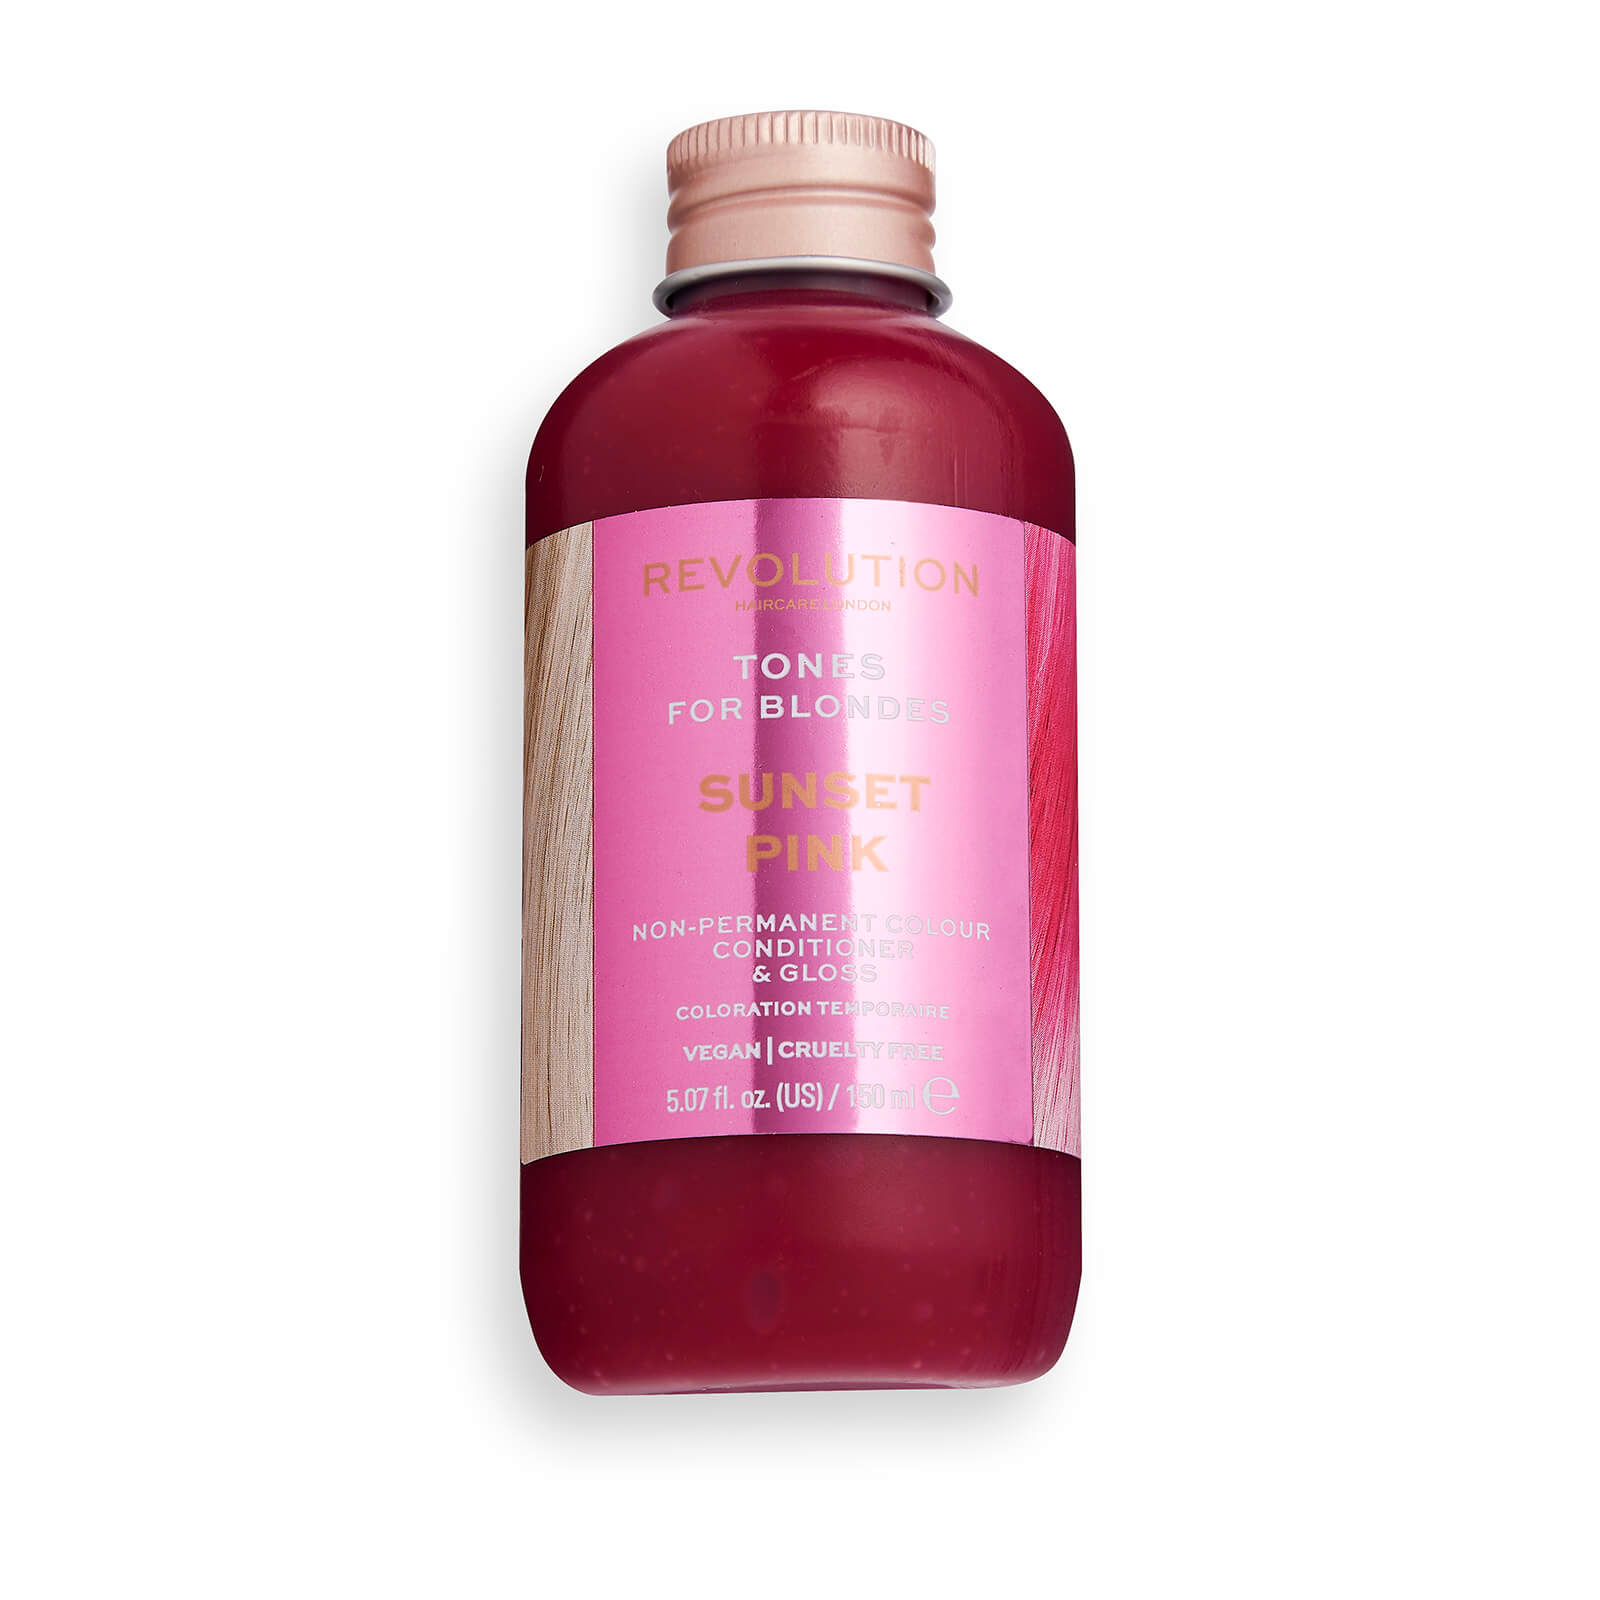 Revolution HairTonesfor Blondes 150ml (Various Shades) - Sunset Pink